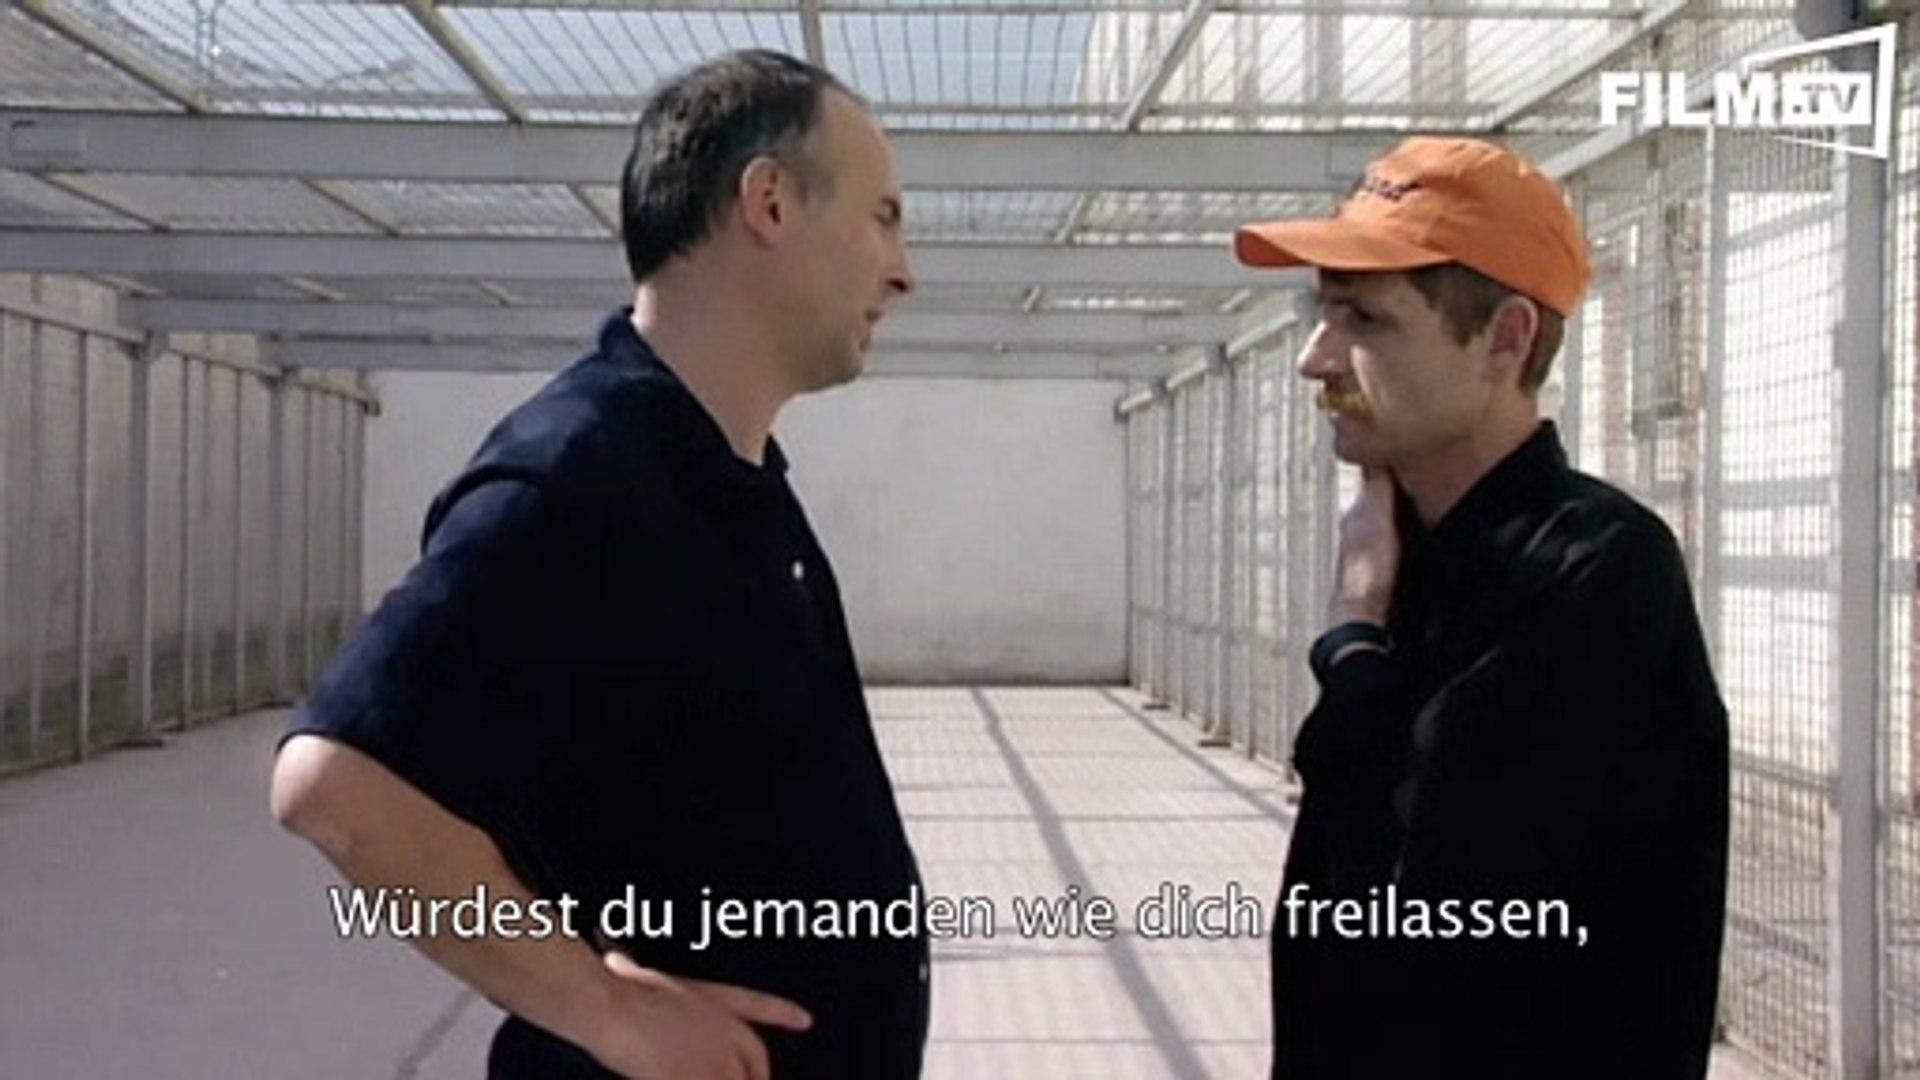 Himmelverbot - Trailer - Filmkritik (2015) - Trailer